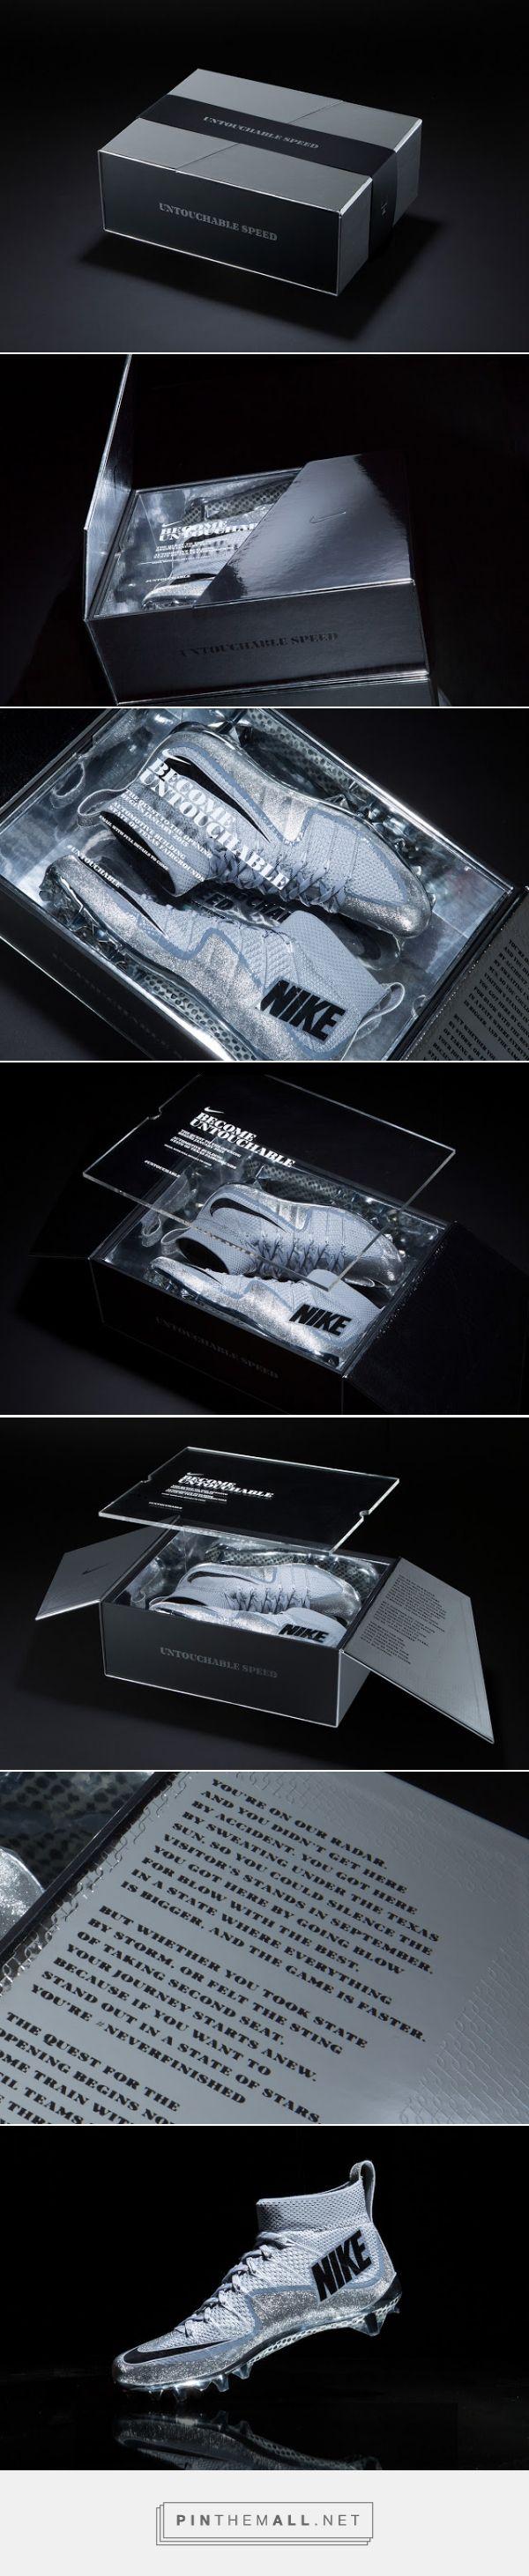 Nike Football Untouchable packaging designed by Hovercraft Studio - http://www.packagingoftheworld.com/2015/09/nike-football-untouchable.html